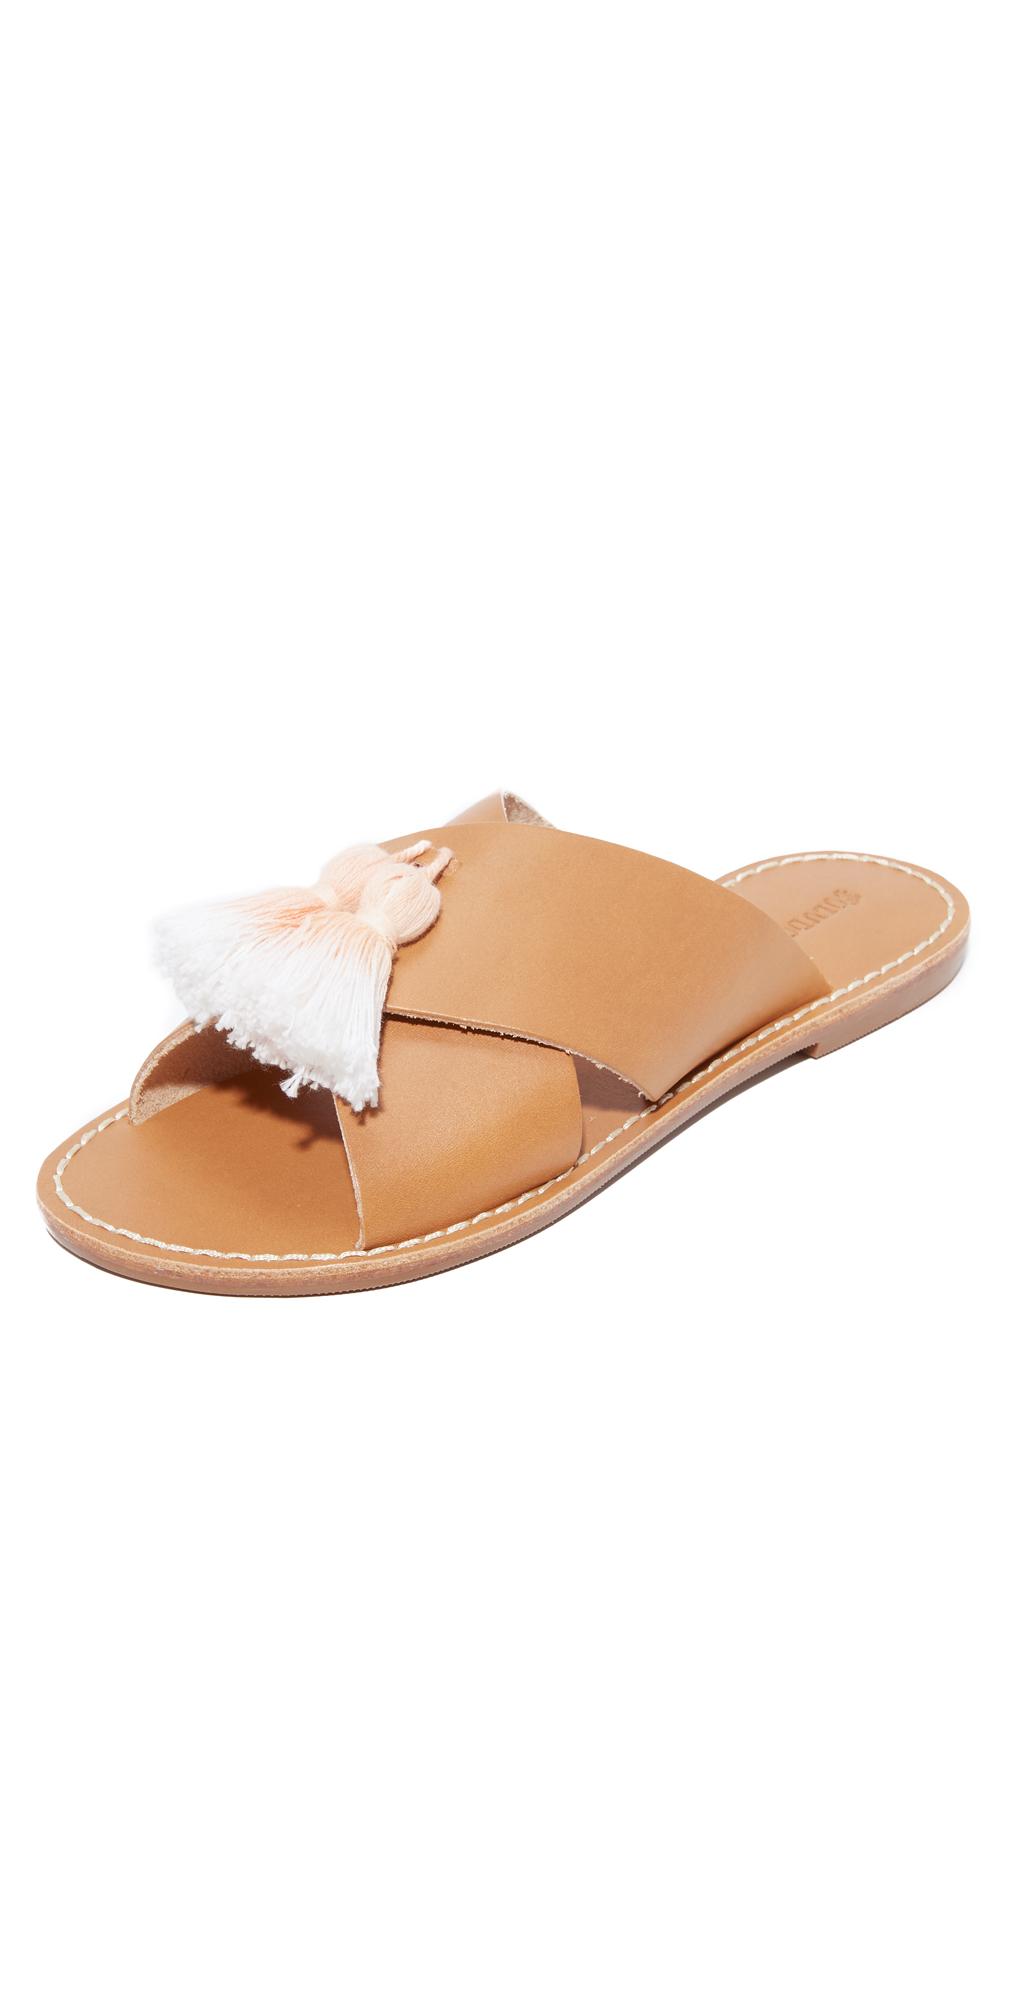 Tassel Crisscross Sandals Soludos